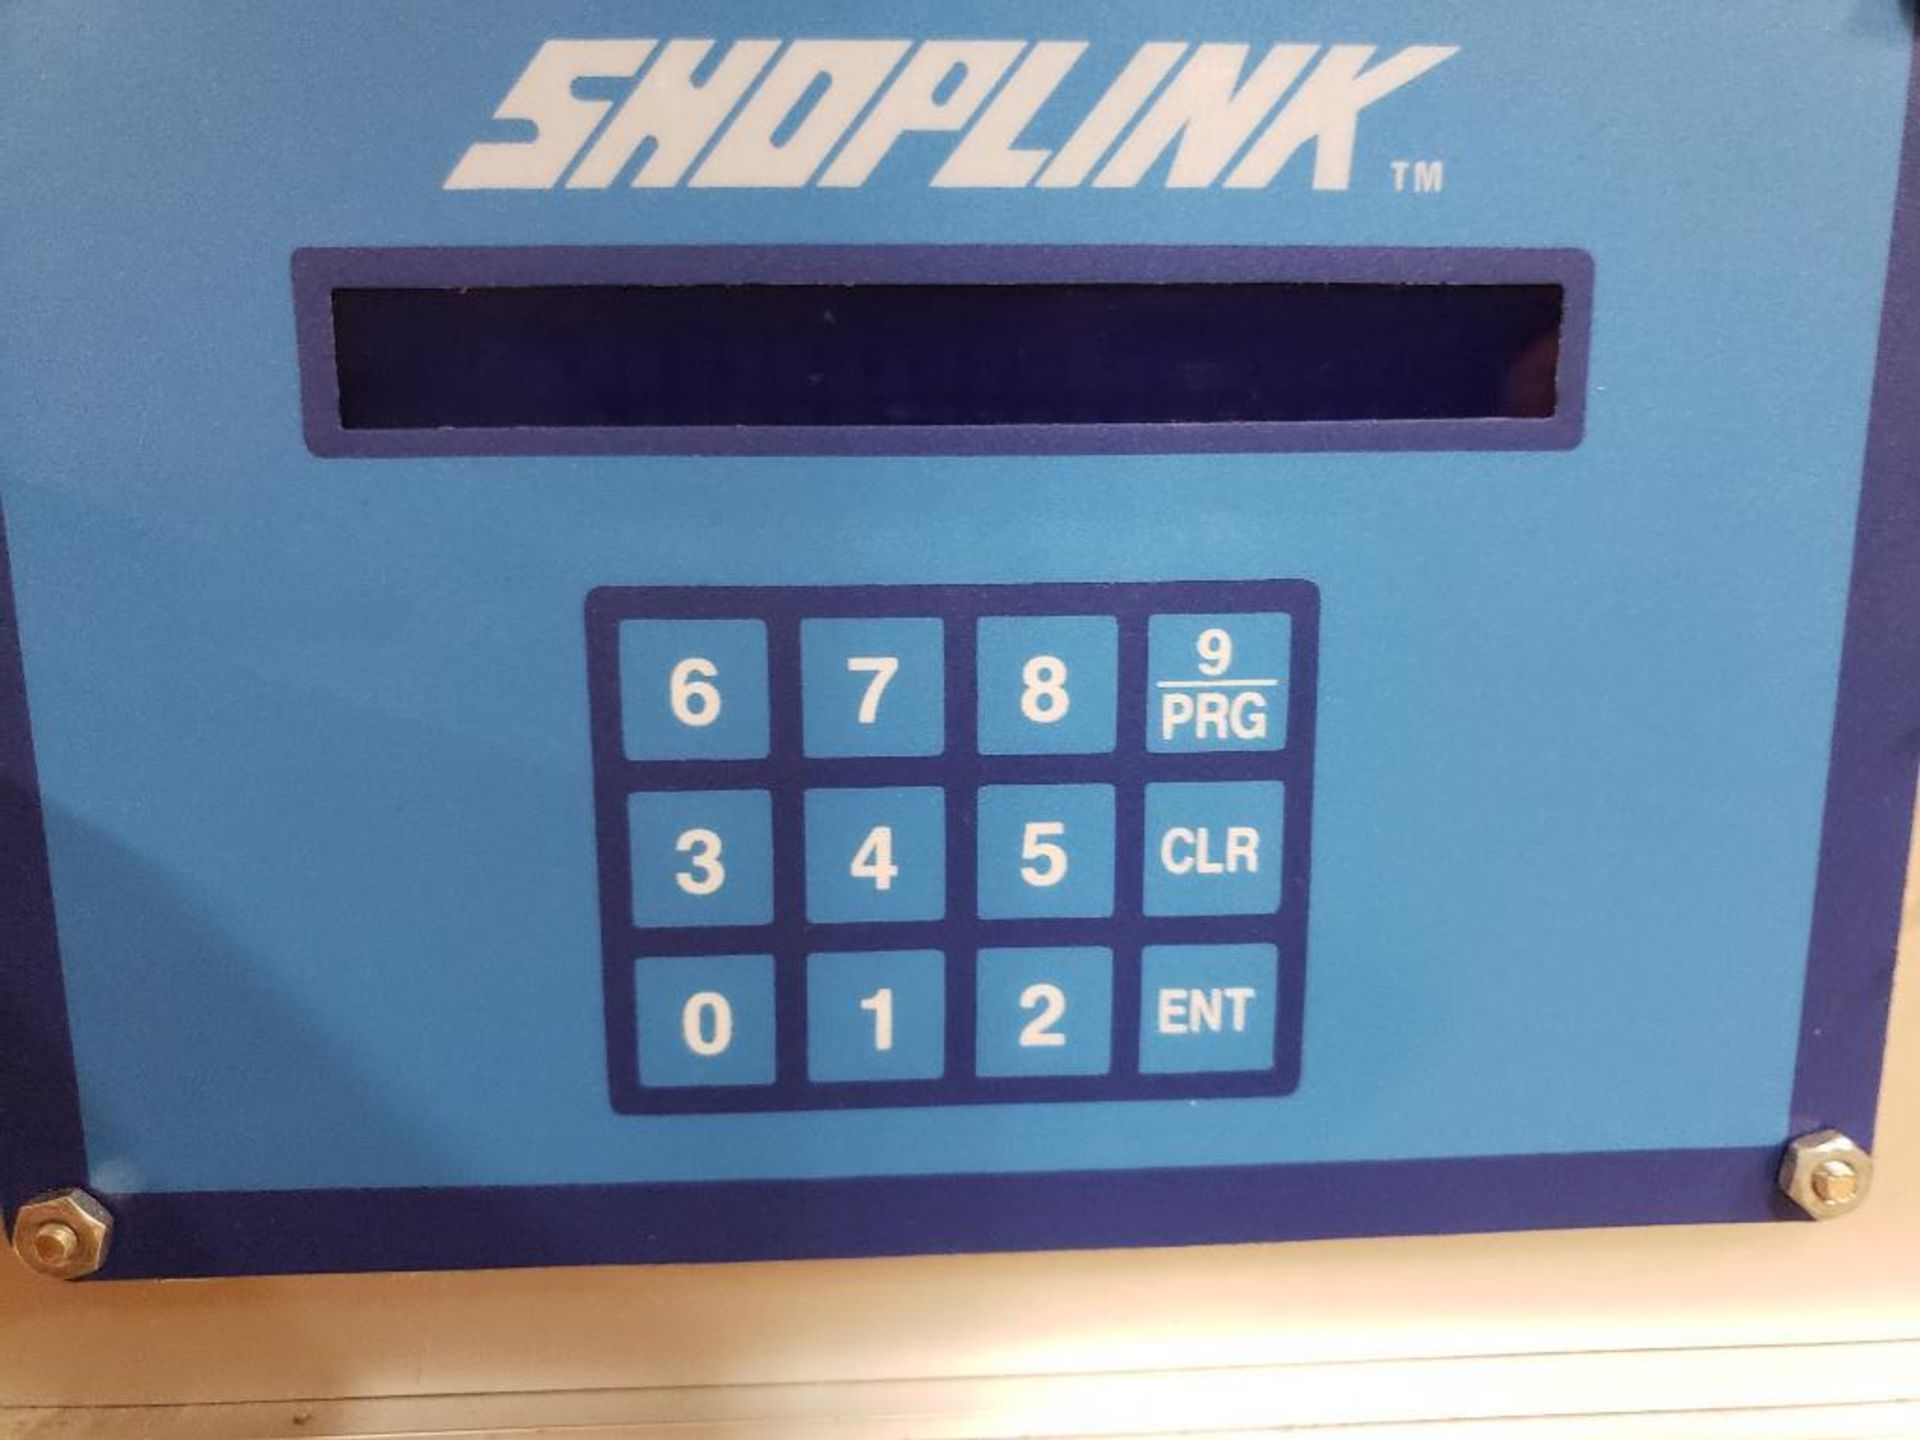 Shoplink control box setup. - Image 3 of 6